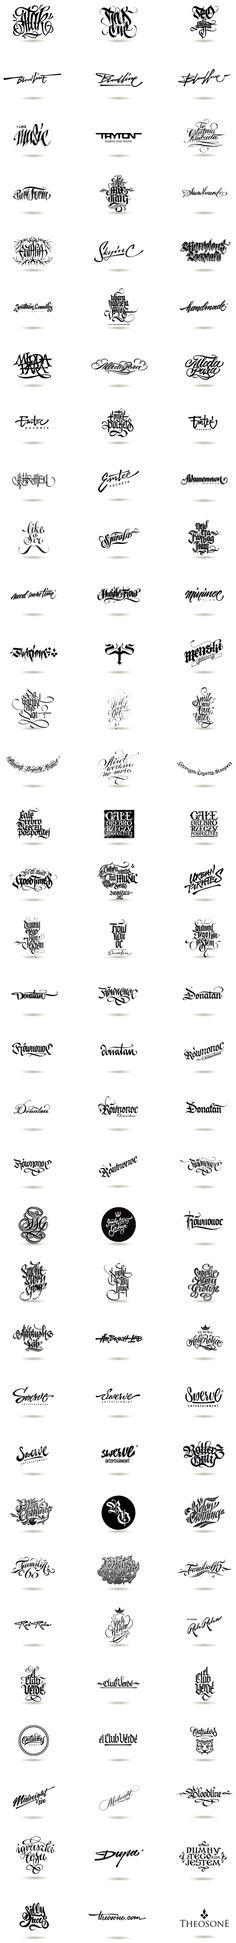 Calligraphic Logos by THEOSONE Adam Romuald Klodecki, via Behance. Pure awesomeness...